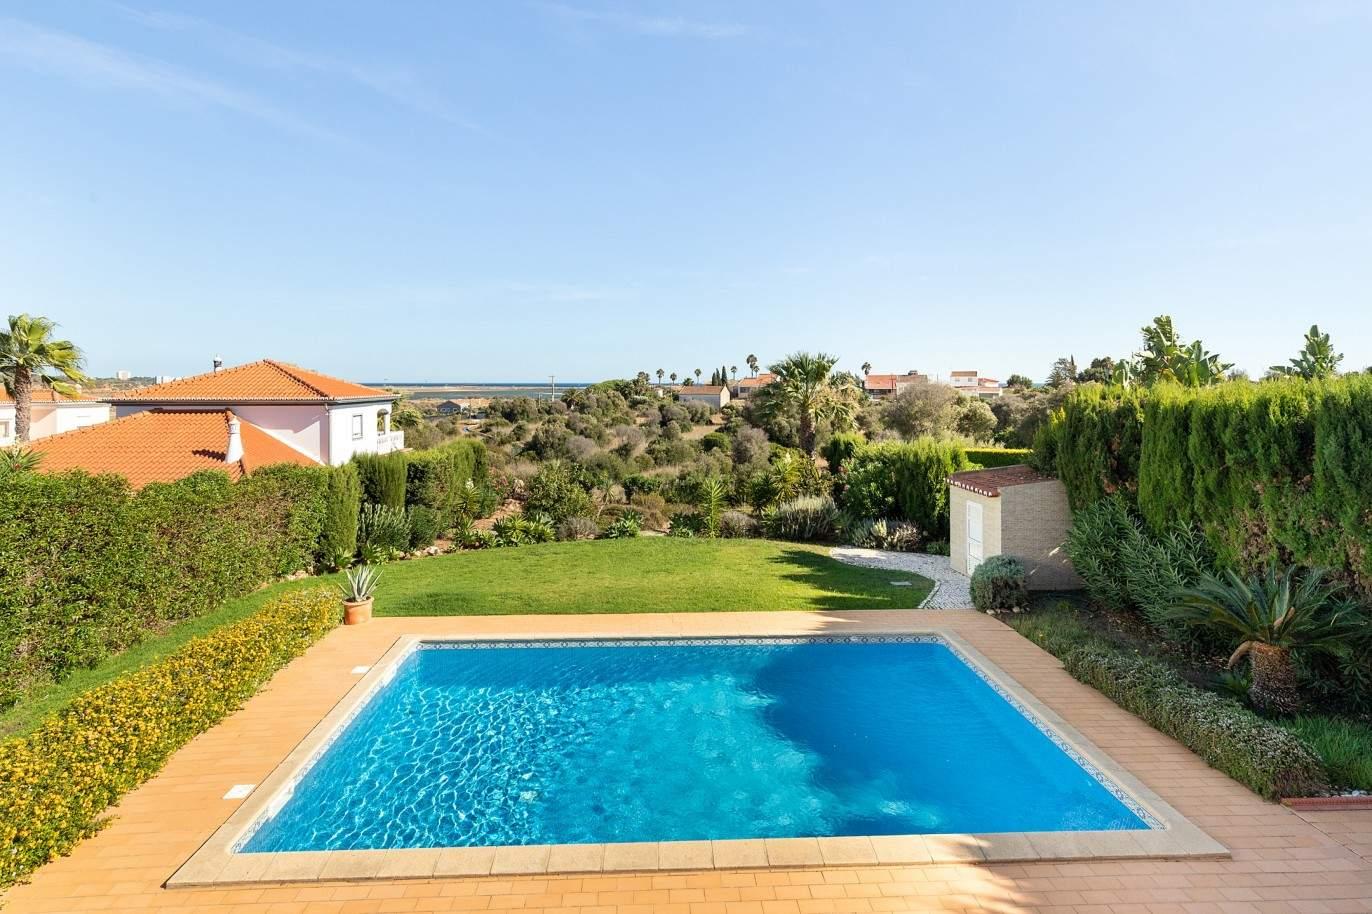 traditional-villa-with-views-to-the-sea-mountains-lagos-algarve